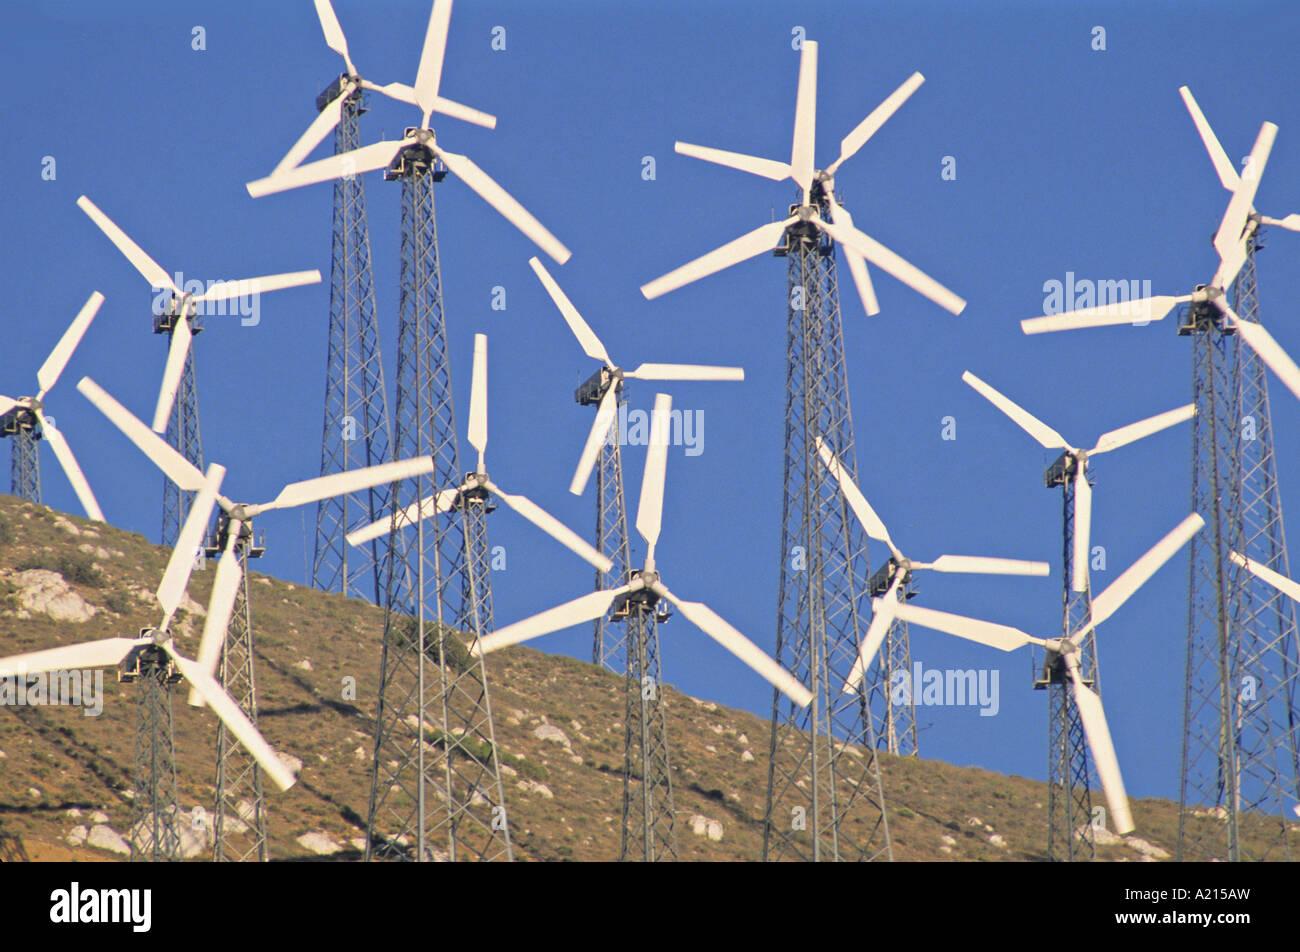 wind turbines Tehachapi California - Stock Image